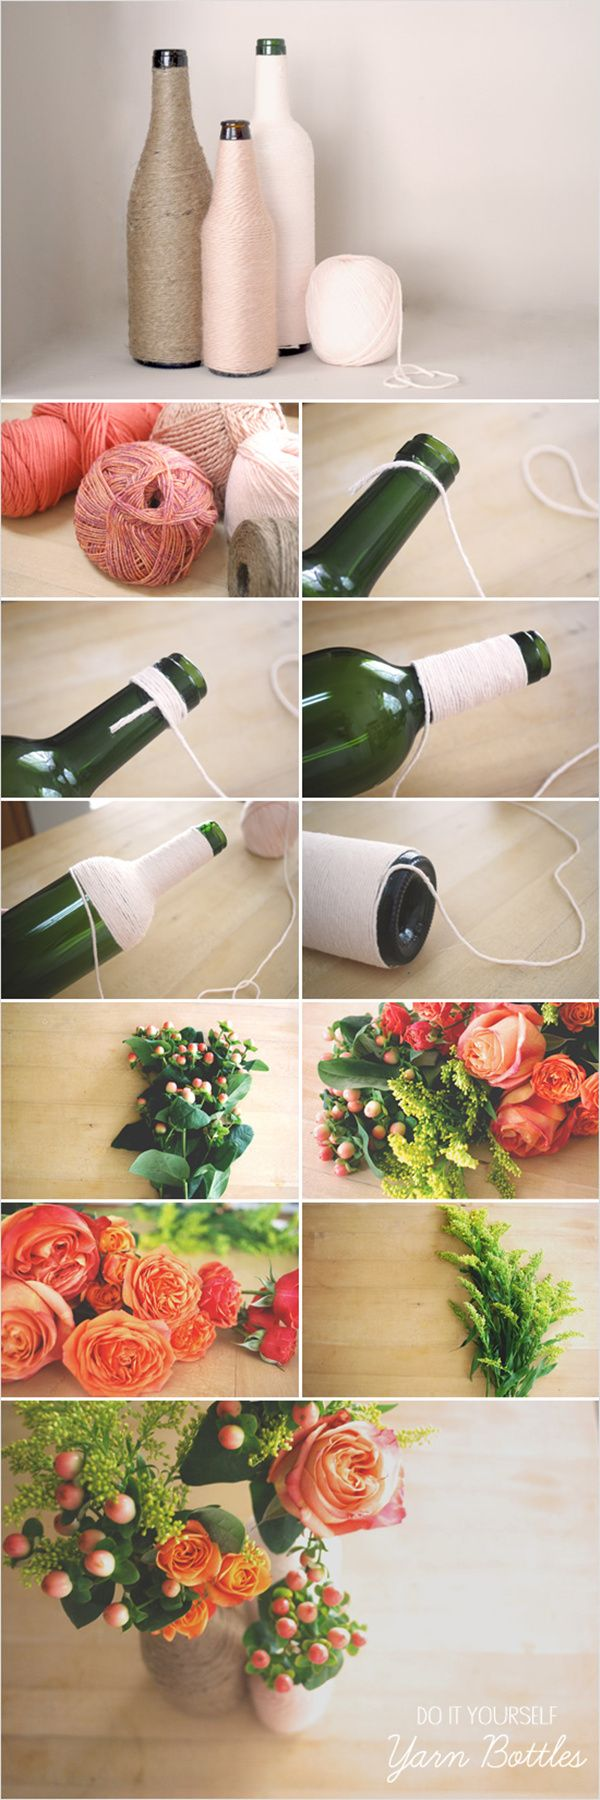 creative diy wedding ideas for spring spring wedding